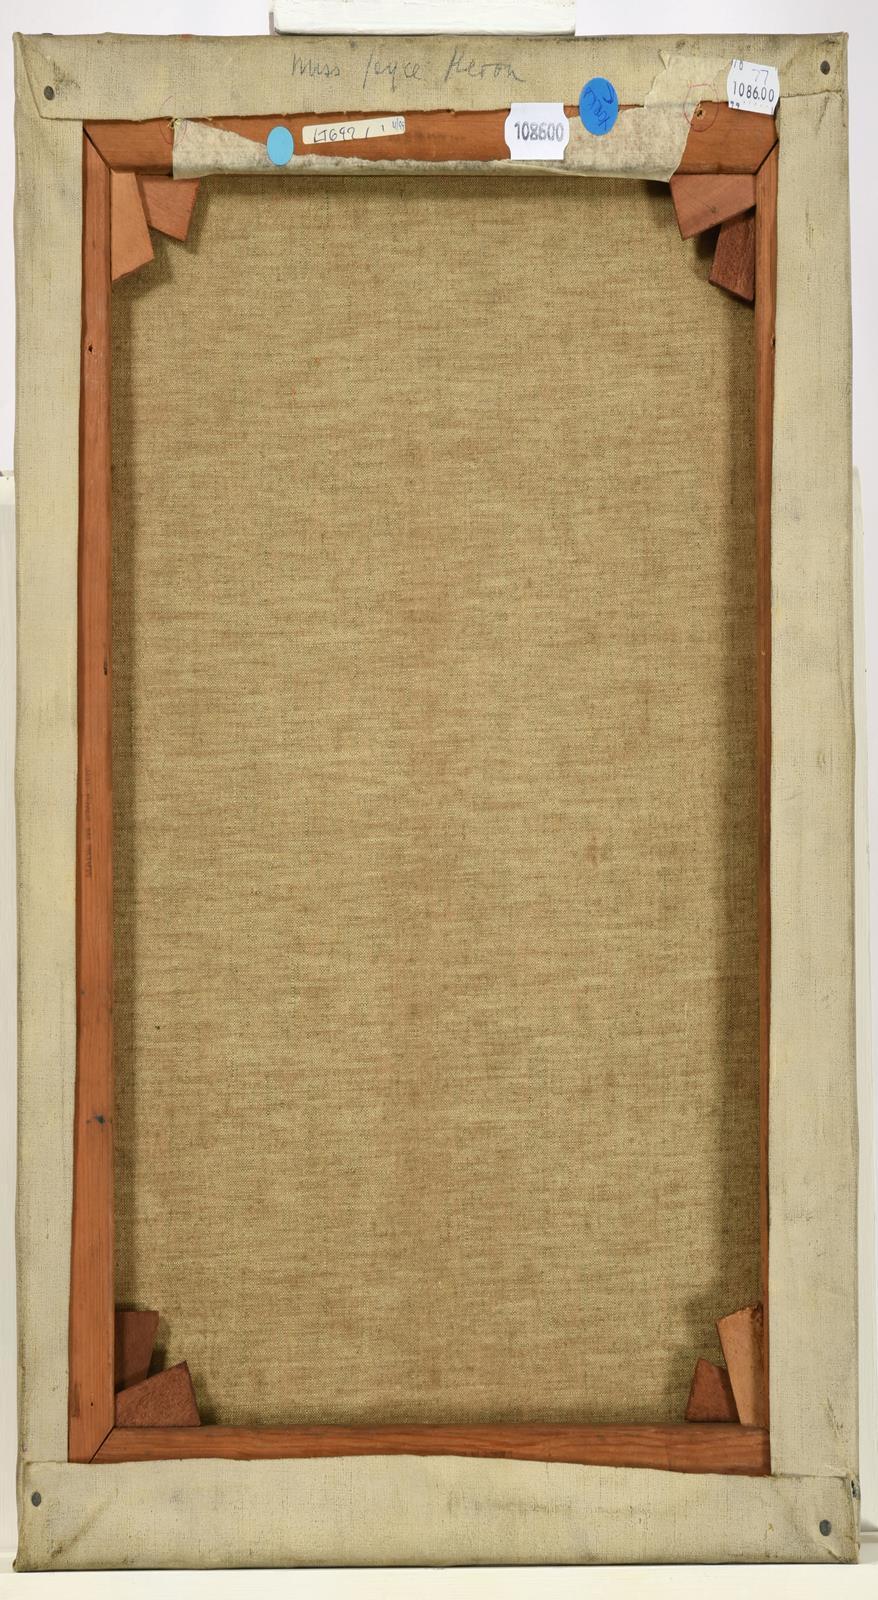 Jacob Kramer (1892-1962) ''Miss Joyce Heron'', head and shoulders portrait sketch in profile Signed, - Image 2 of 2